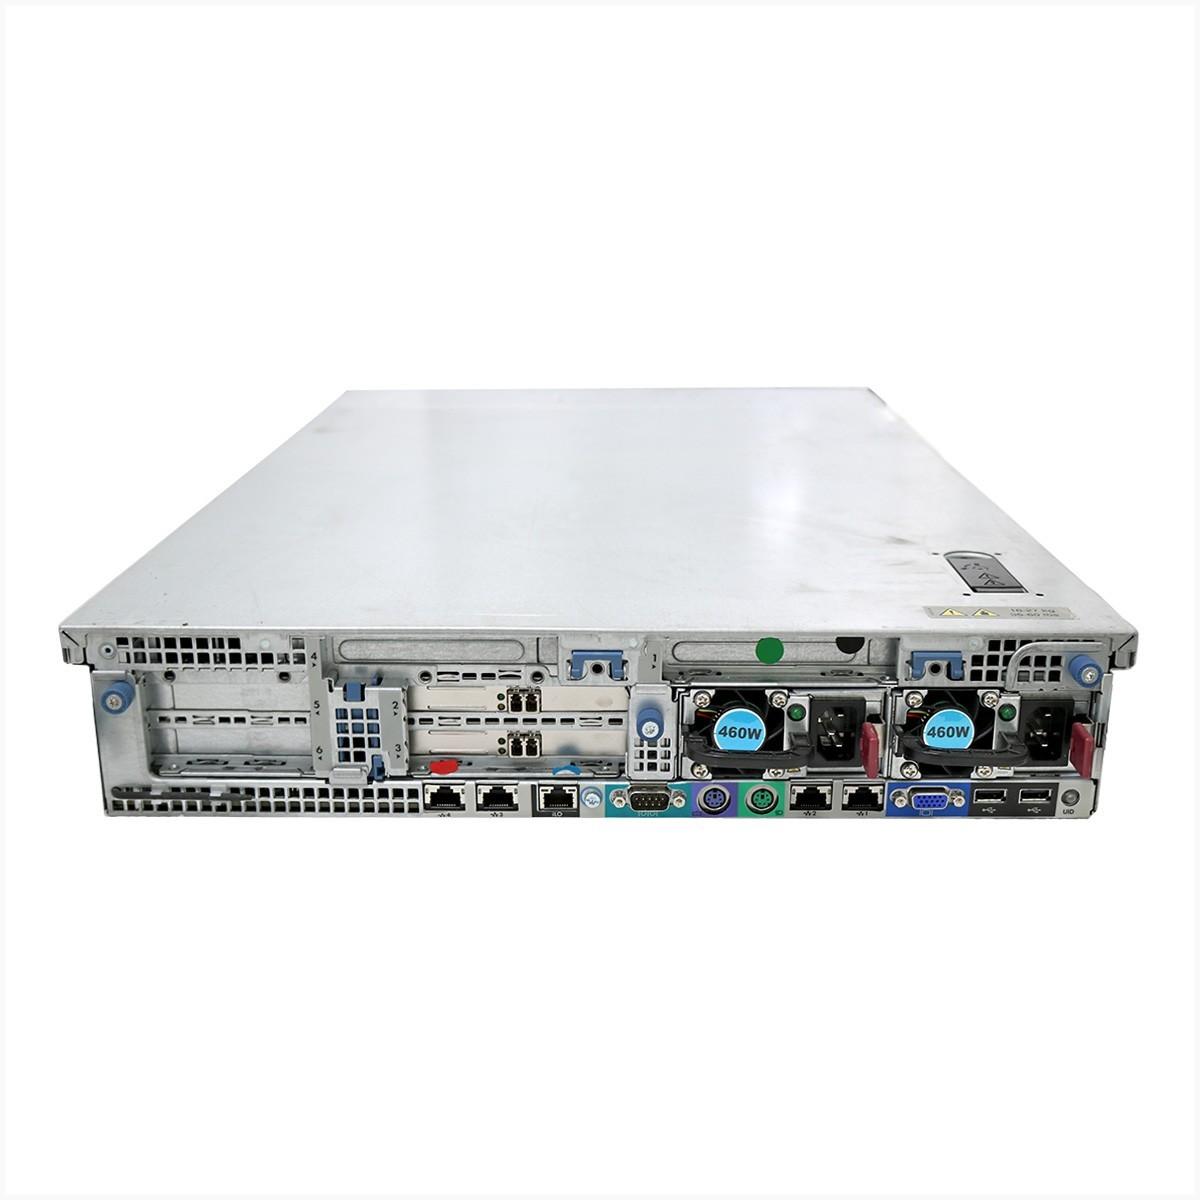 Servidor hp dl380 g7 2x xeon e5649 16gb 2x 1tb - usado